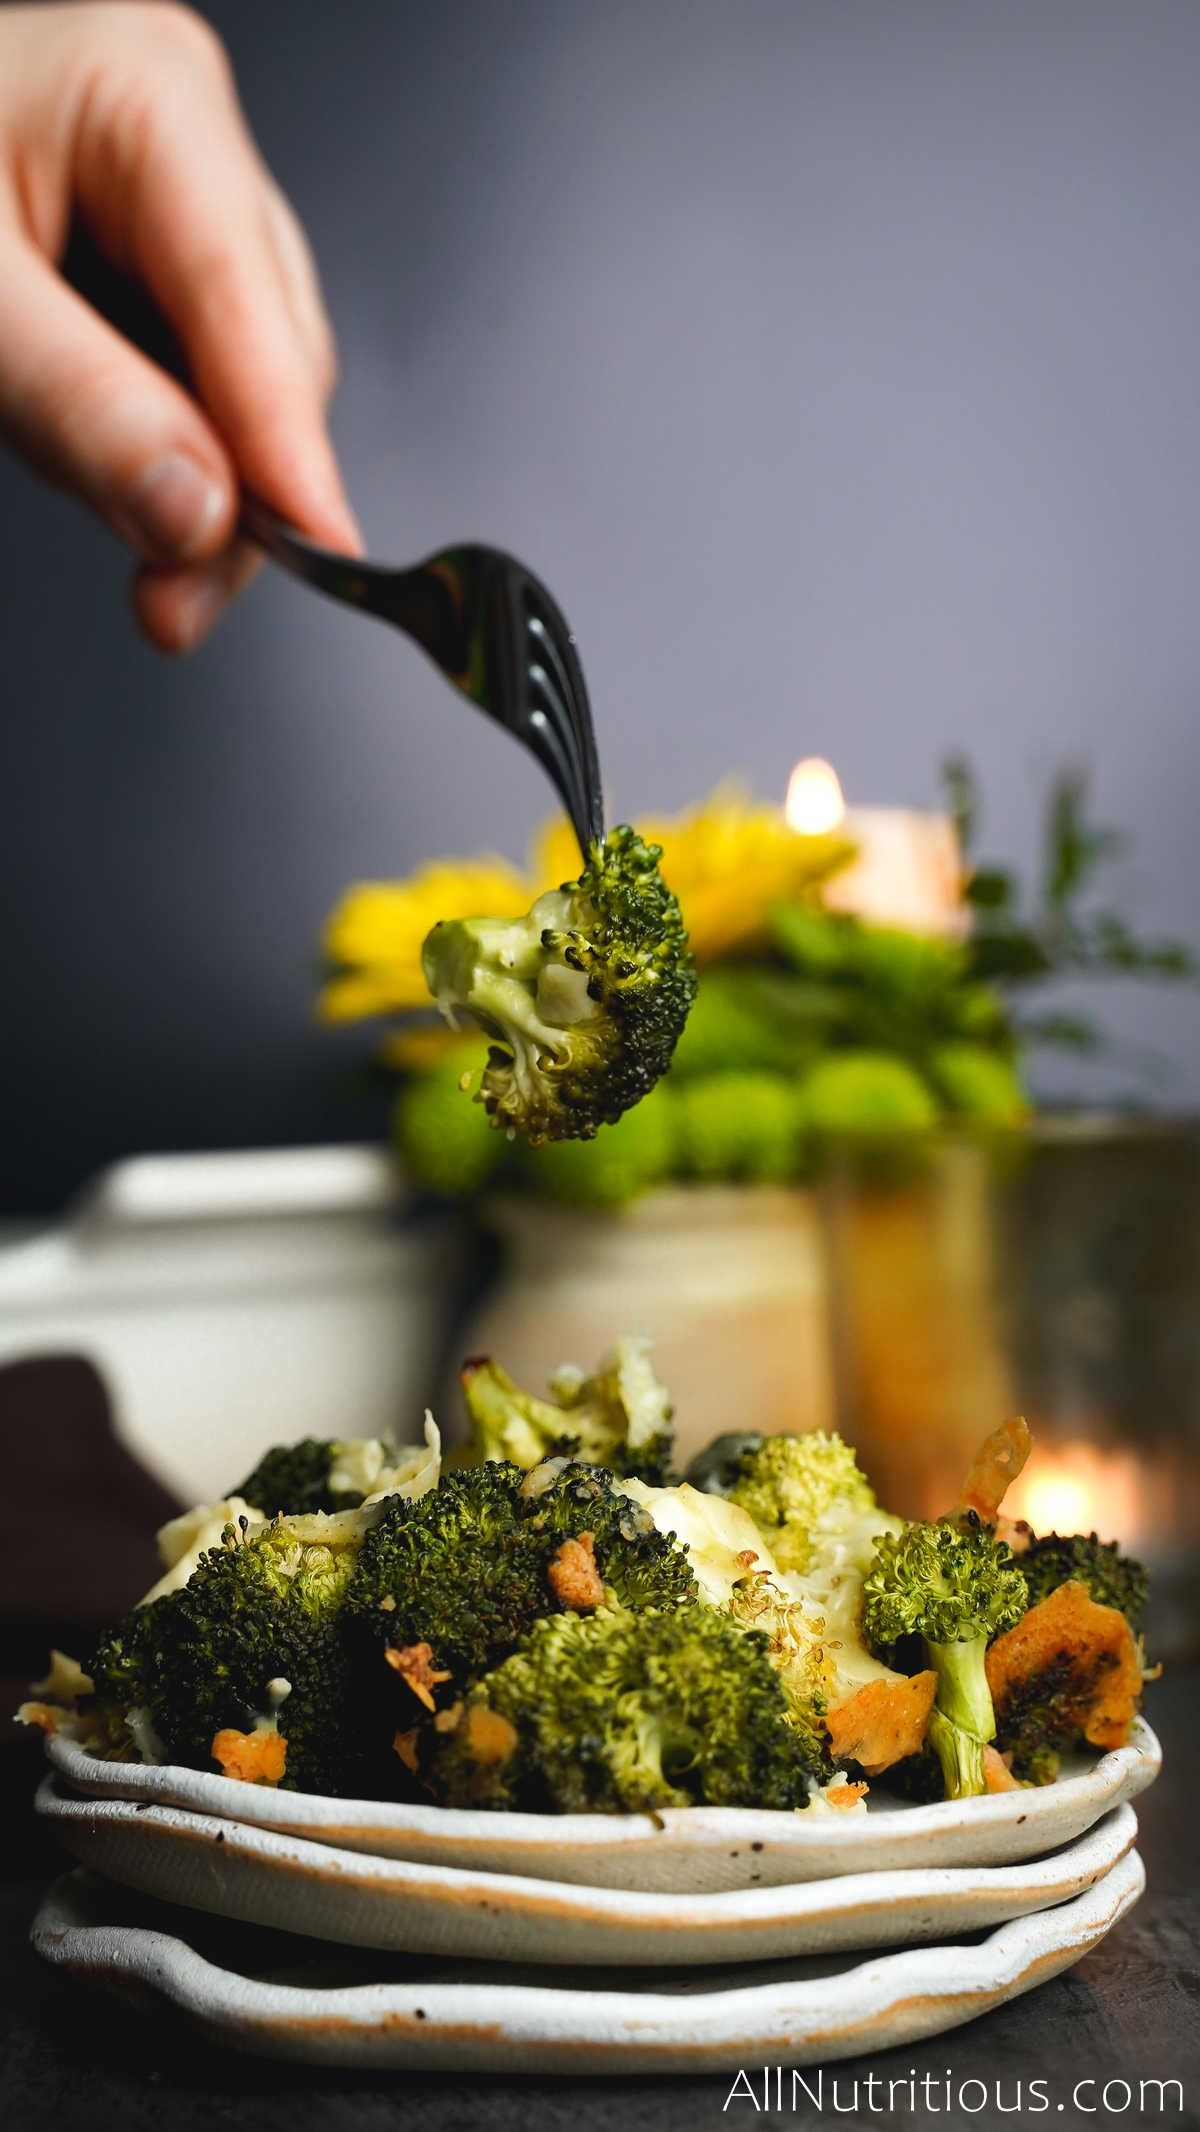 forkful of garlic broccoli